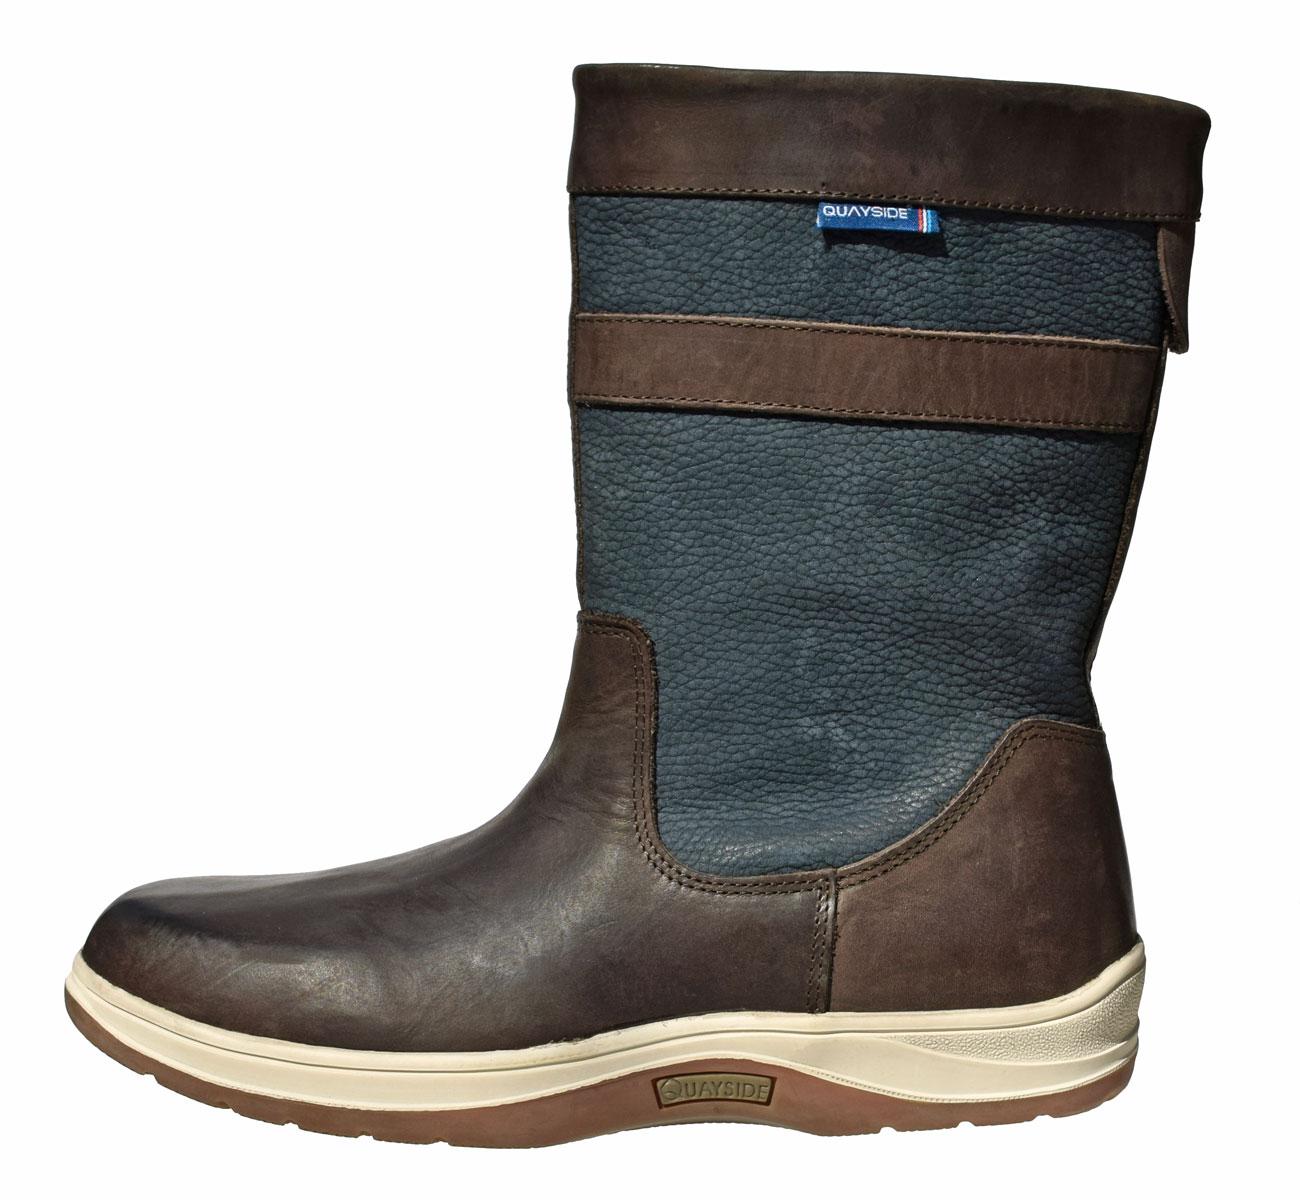 0022f85a18e QUAYSIDE Coastal Half Boots - navy/chestnut